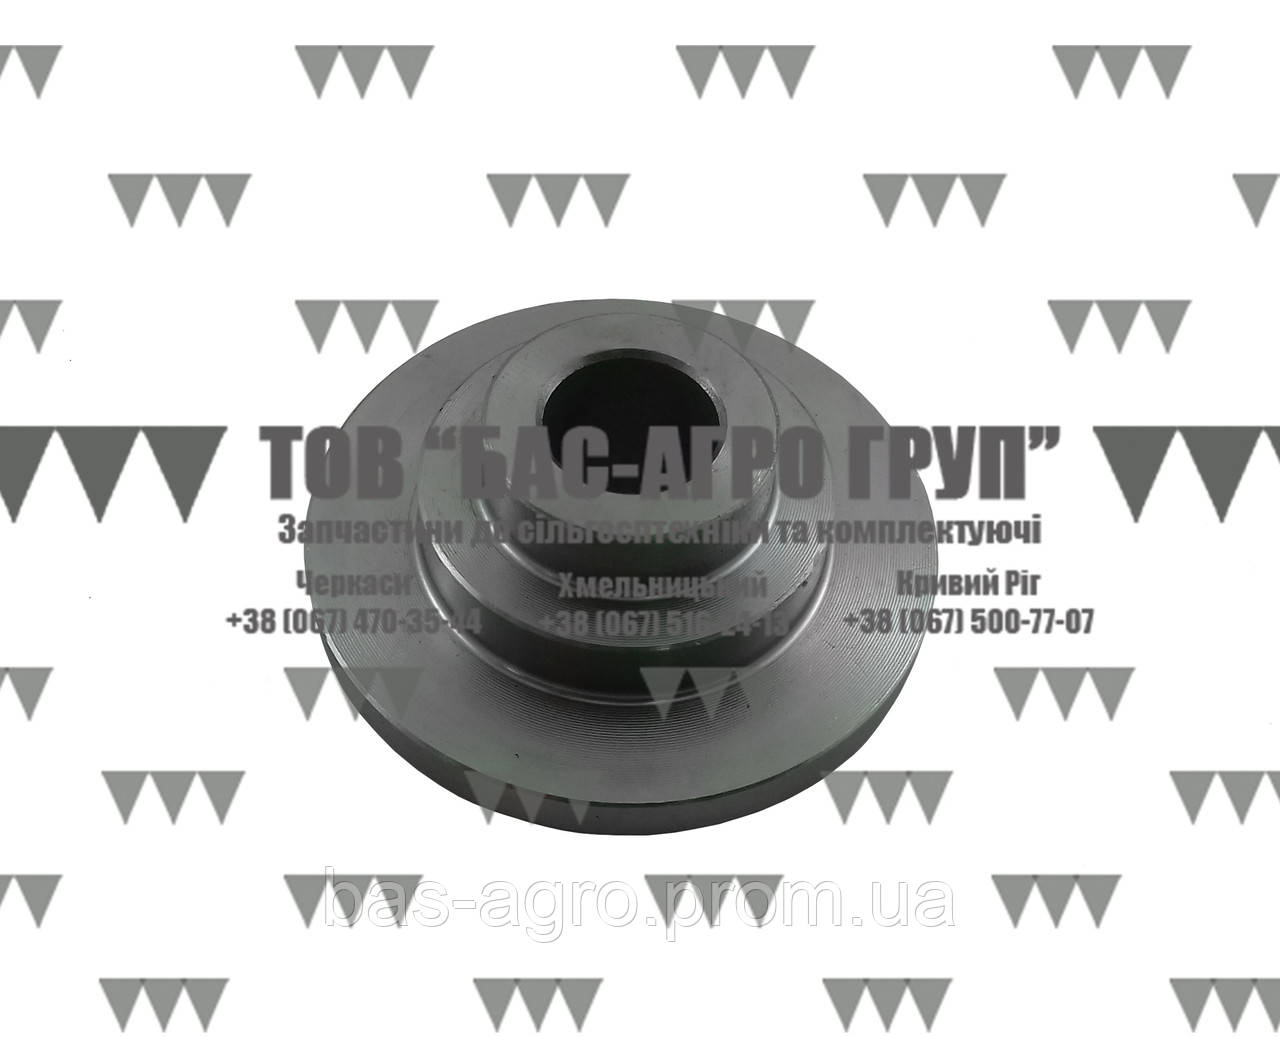 Втулка Geringhoff 502709 аналог